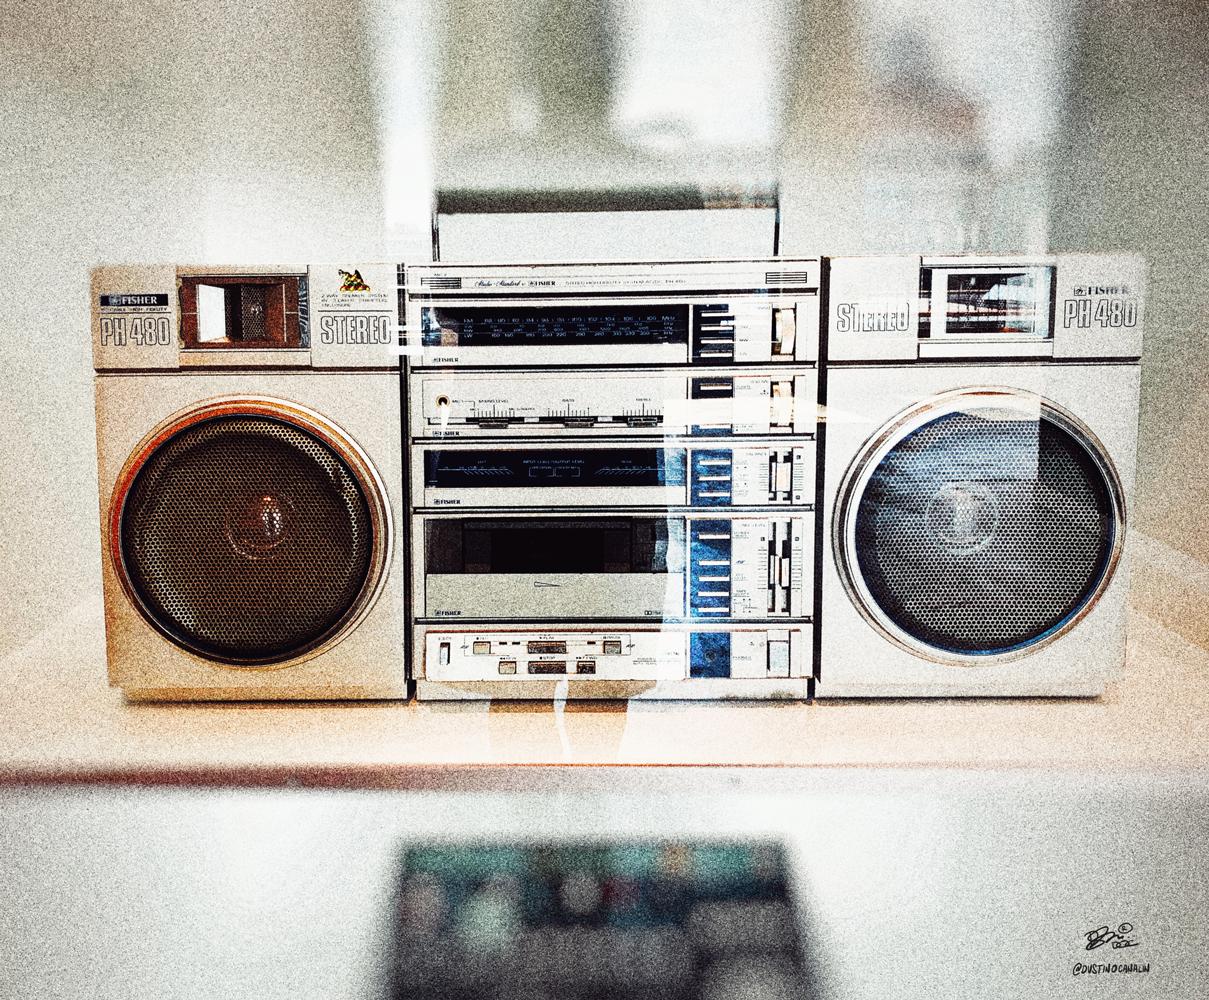 Beyond-radio.jpg